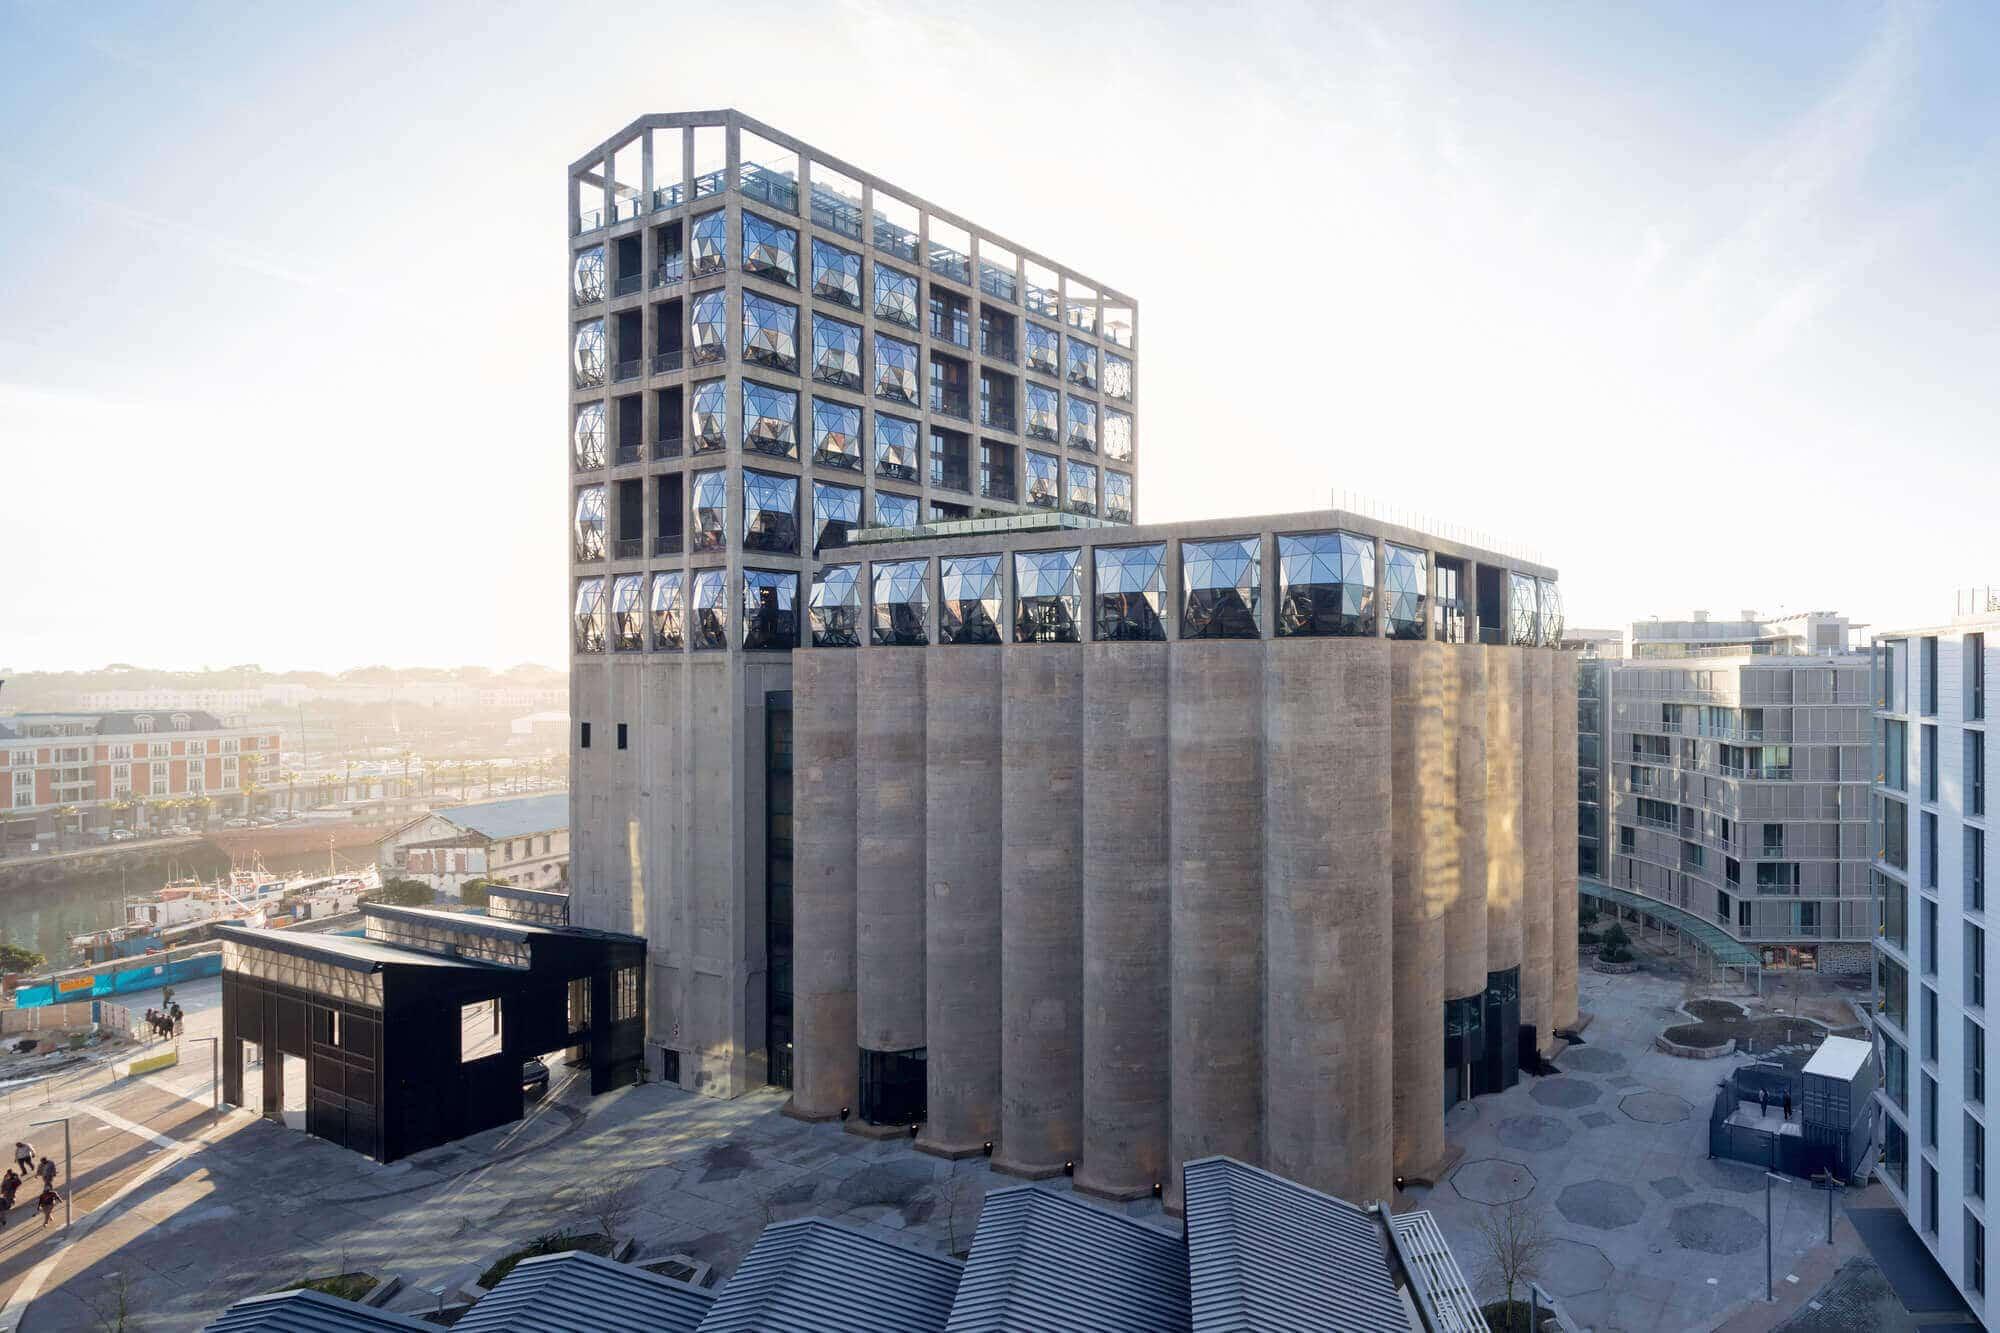 Zeitz Museum of Contemporary Art Africa in Cape Town